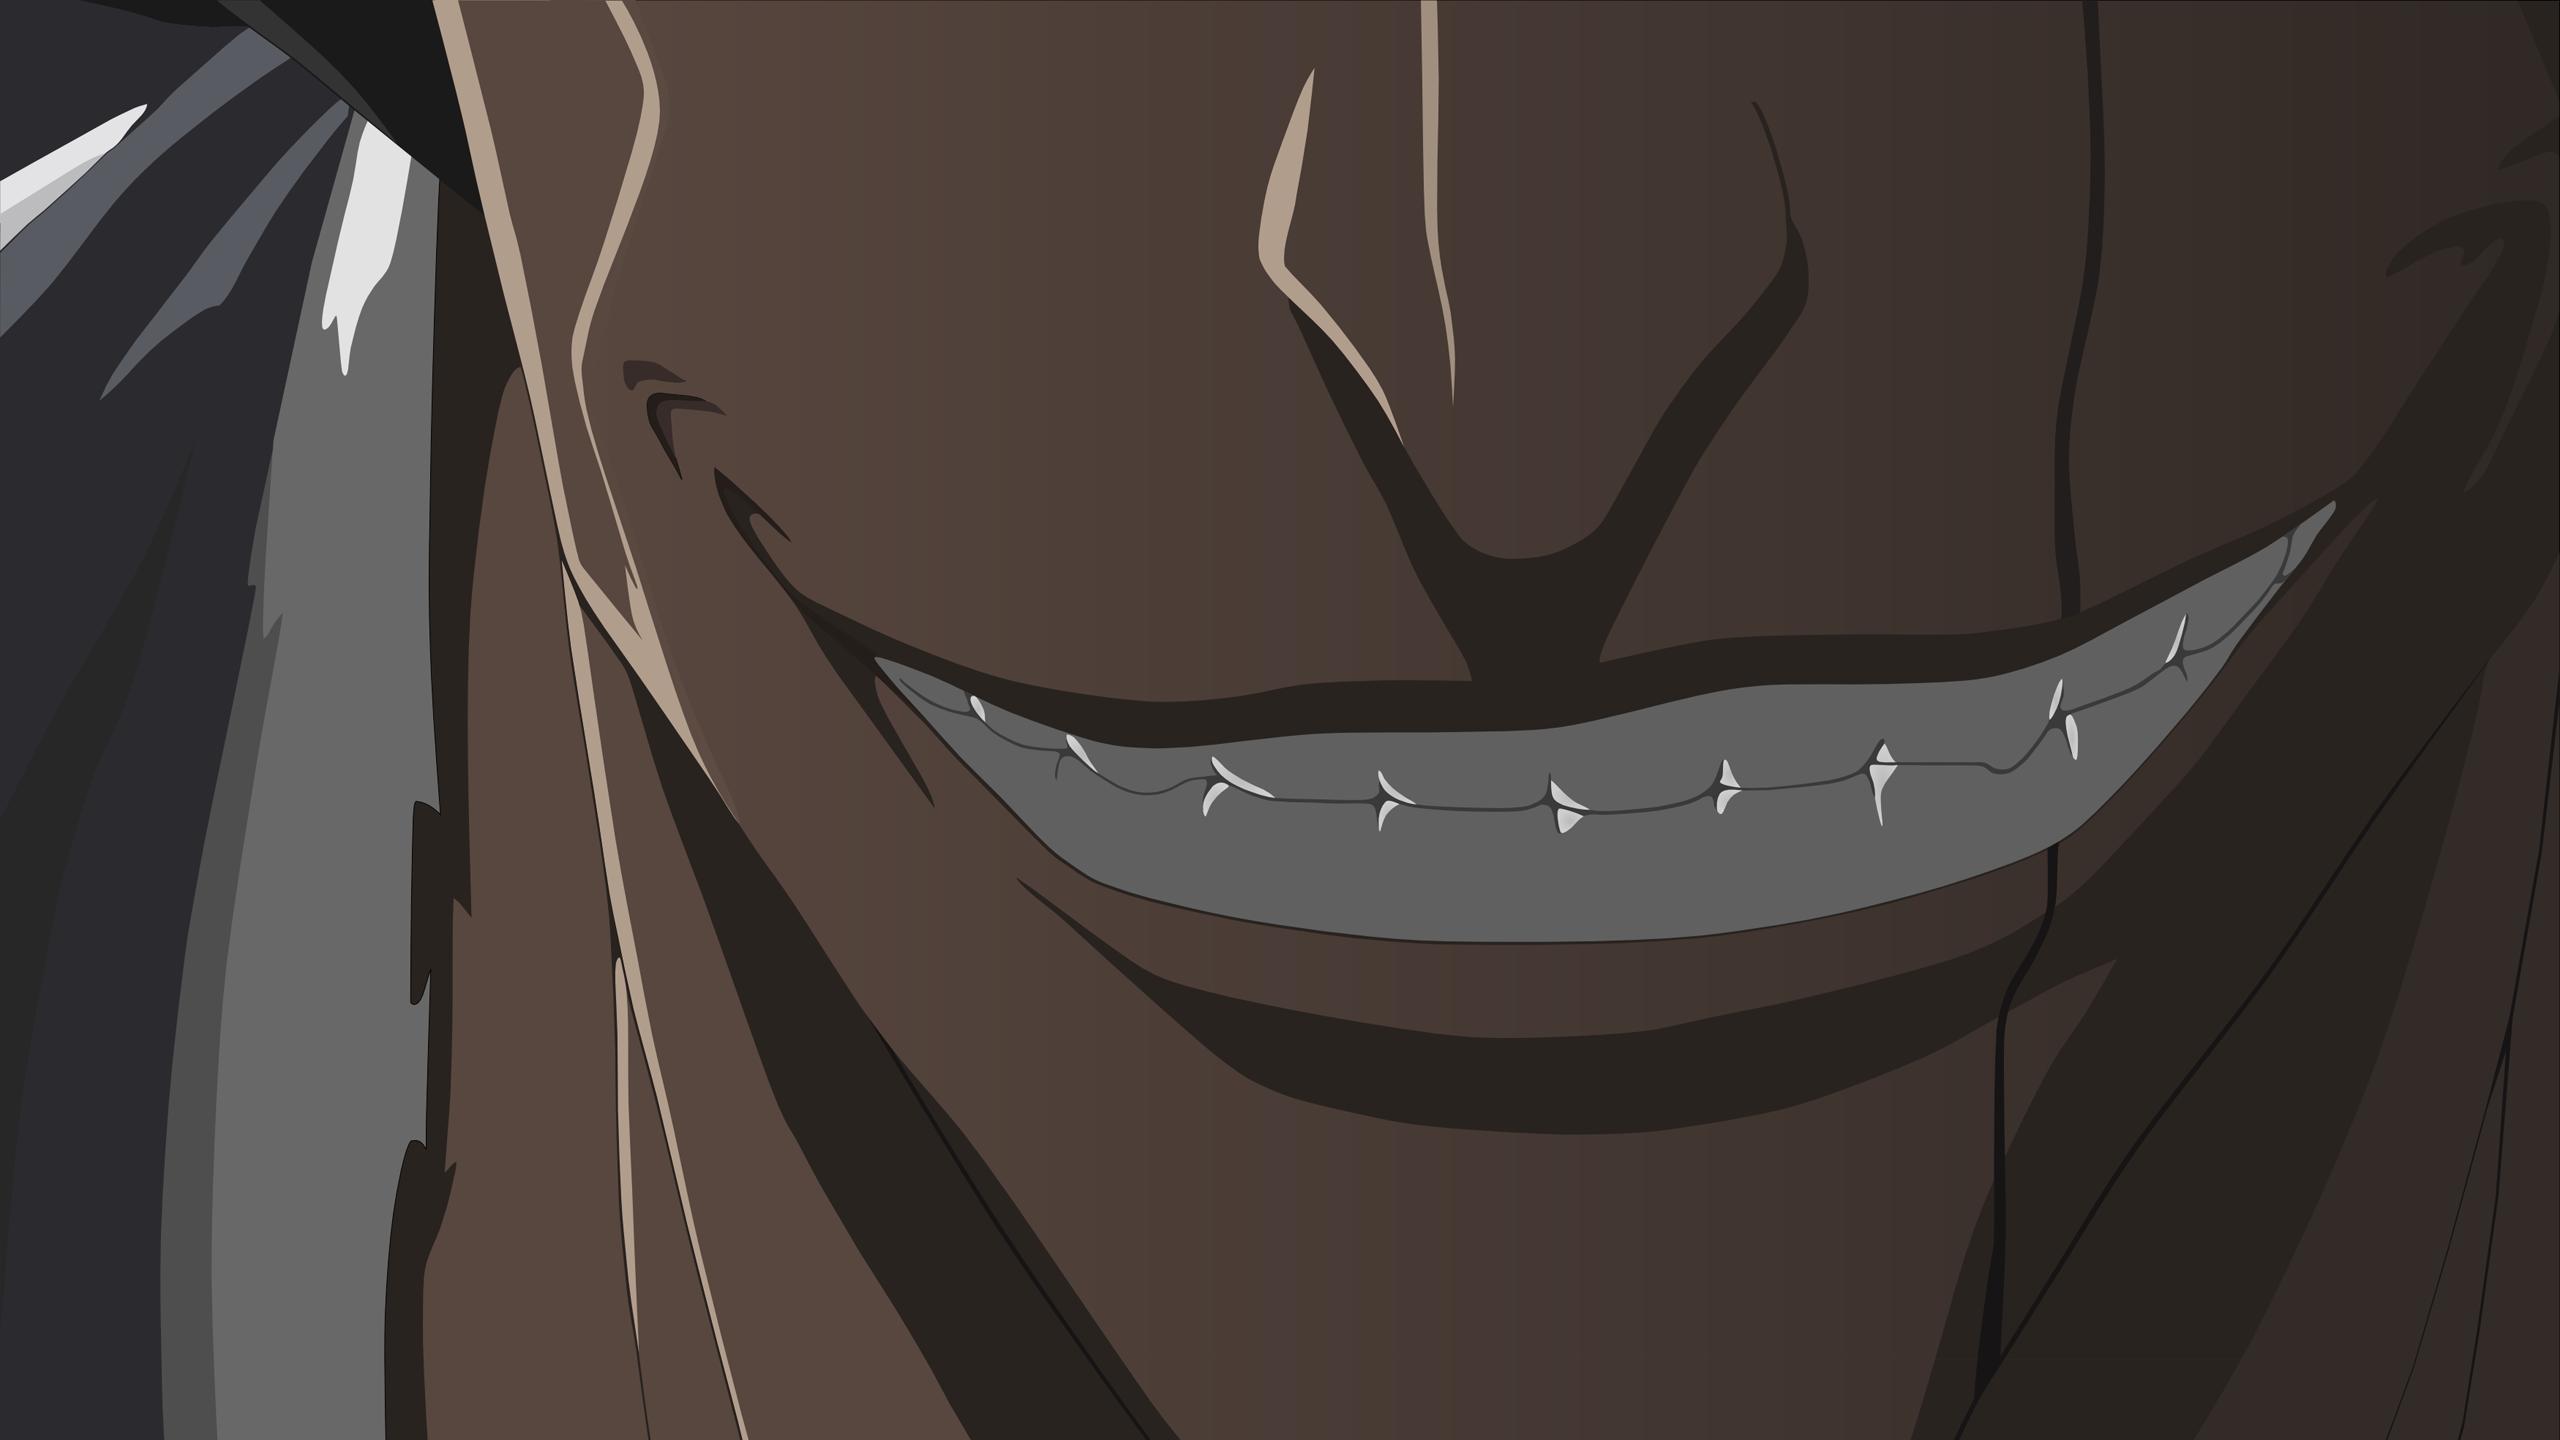 Anime 2560x1440 Bleach anime Zaraki Kenpachi